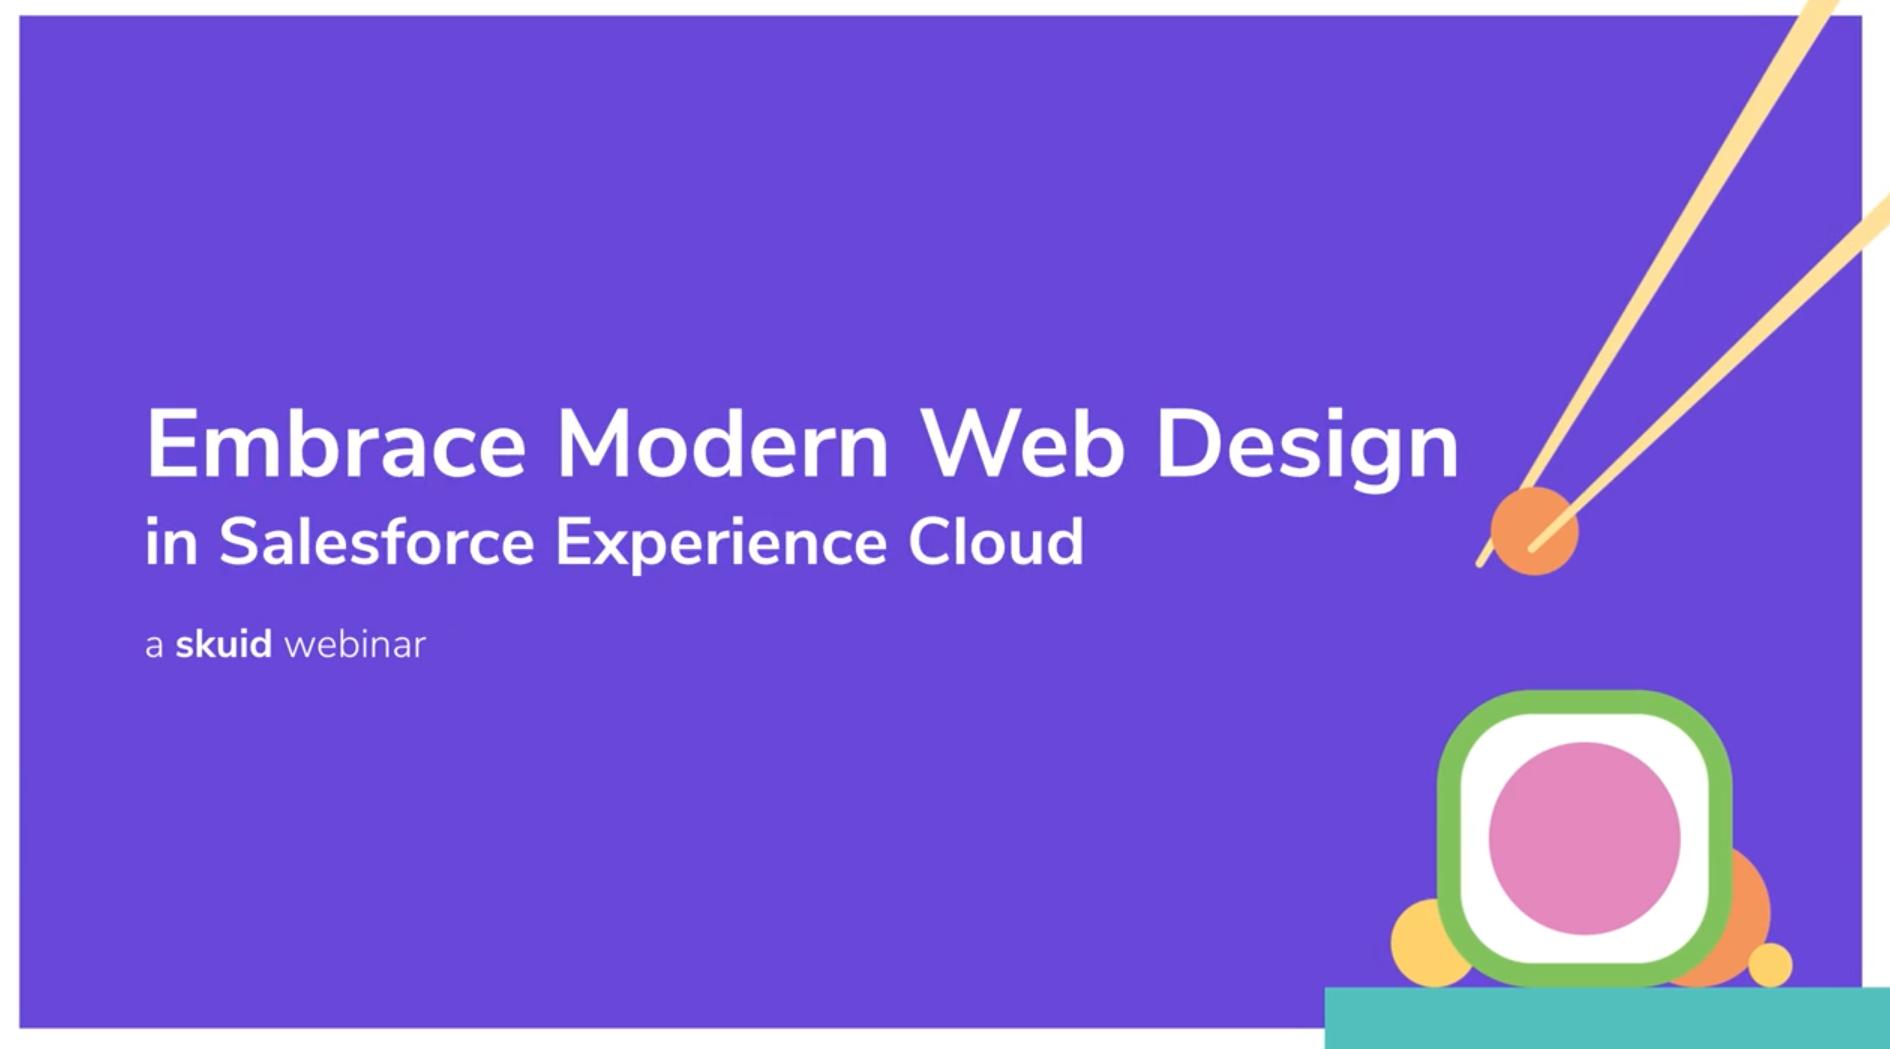 Embrace modern web design in Salesforce Experience Cloud.